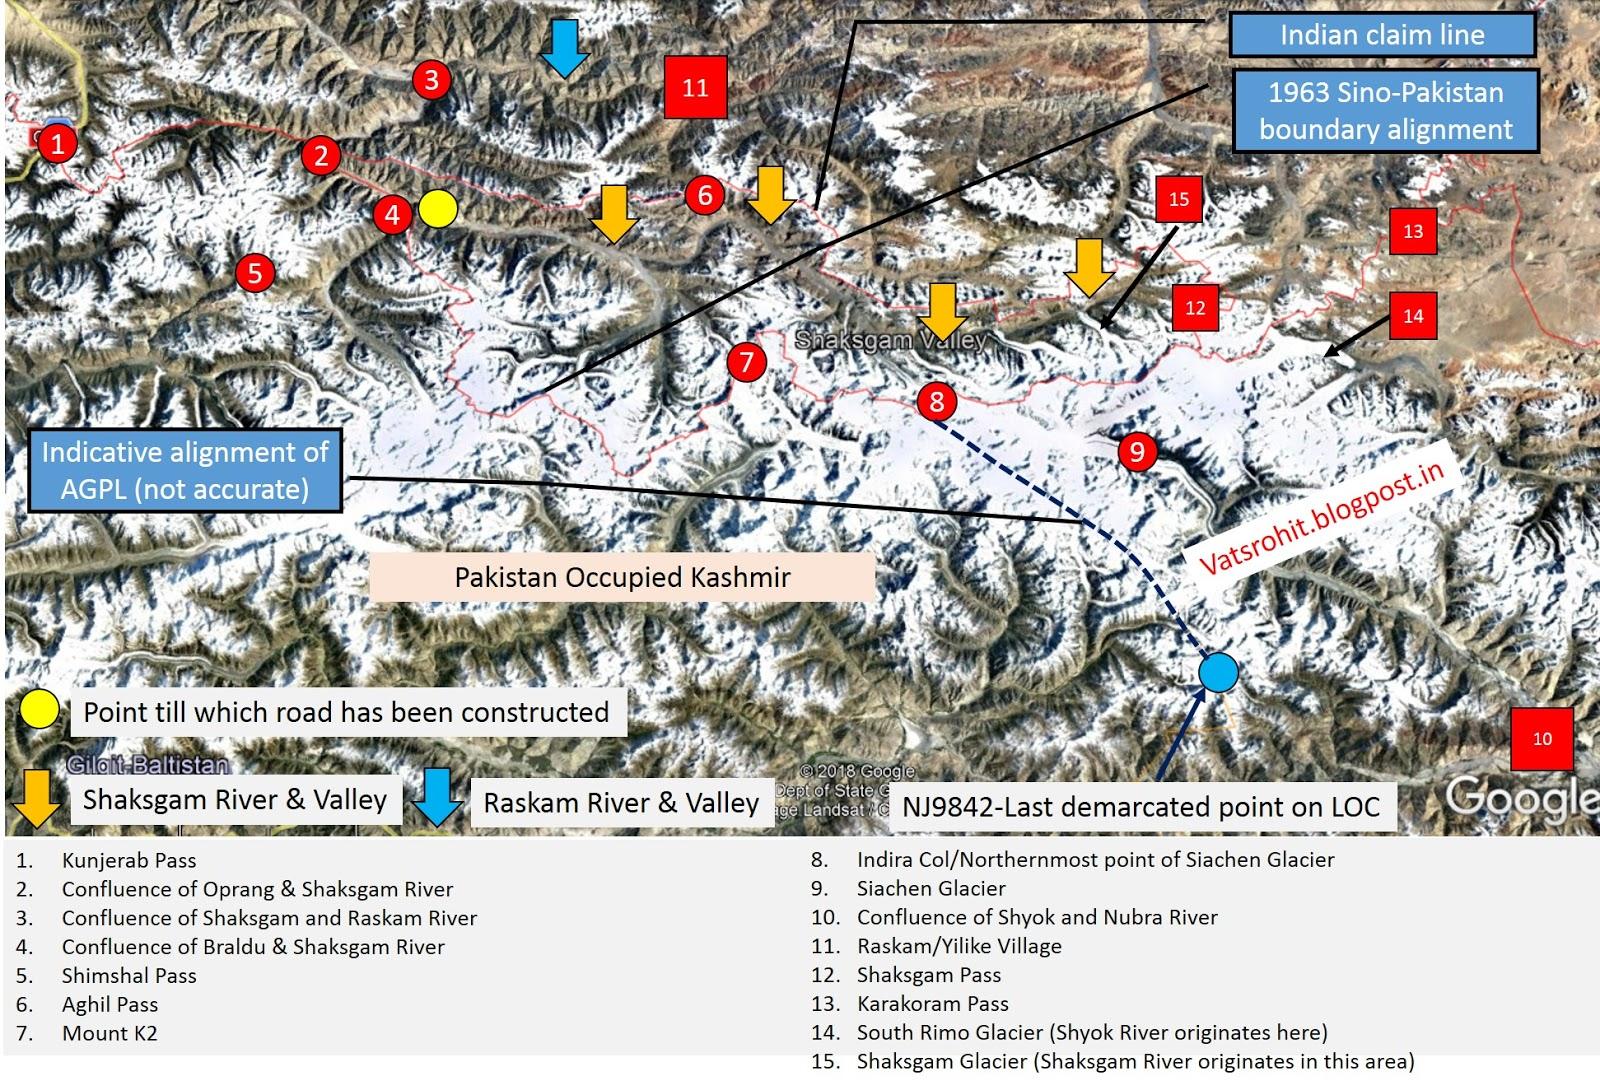 India, China and Shaksgam Valley | Perspective